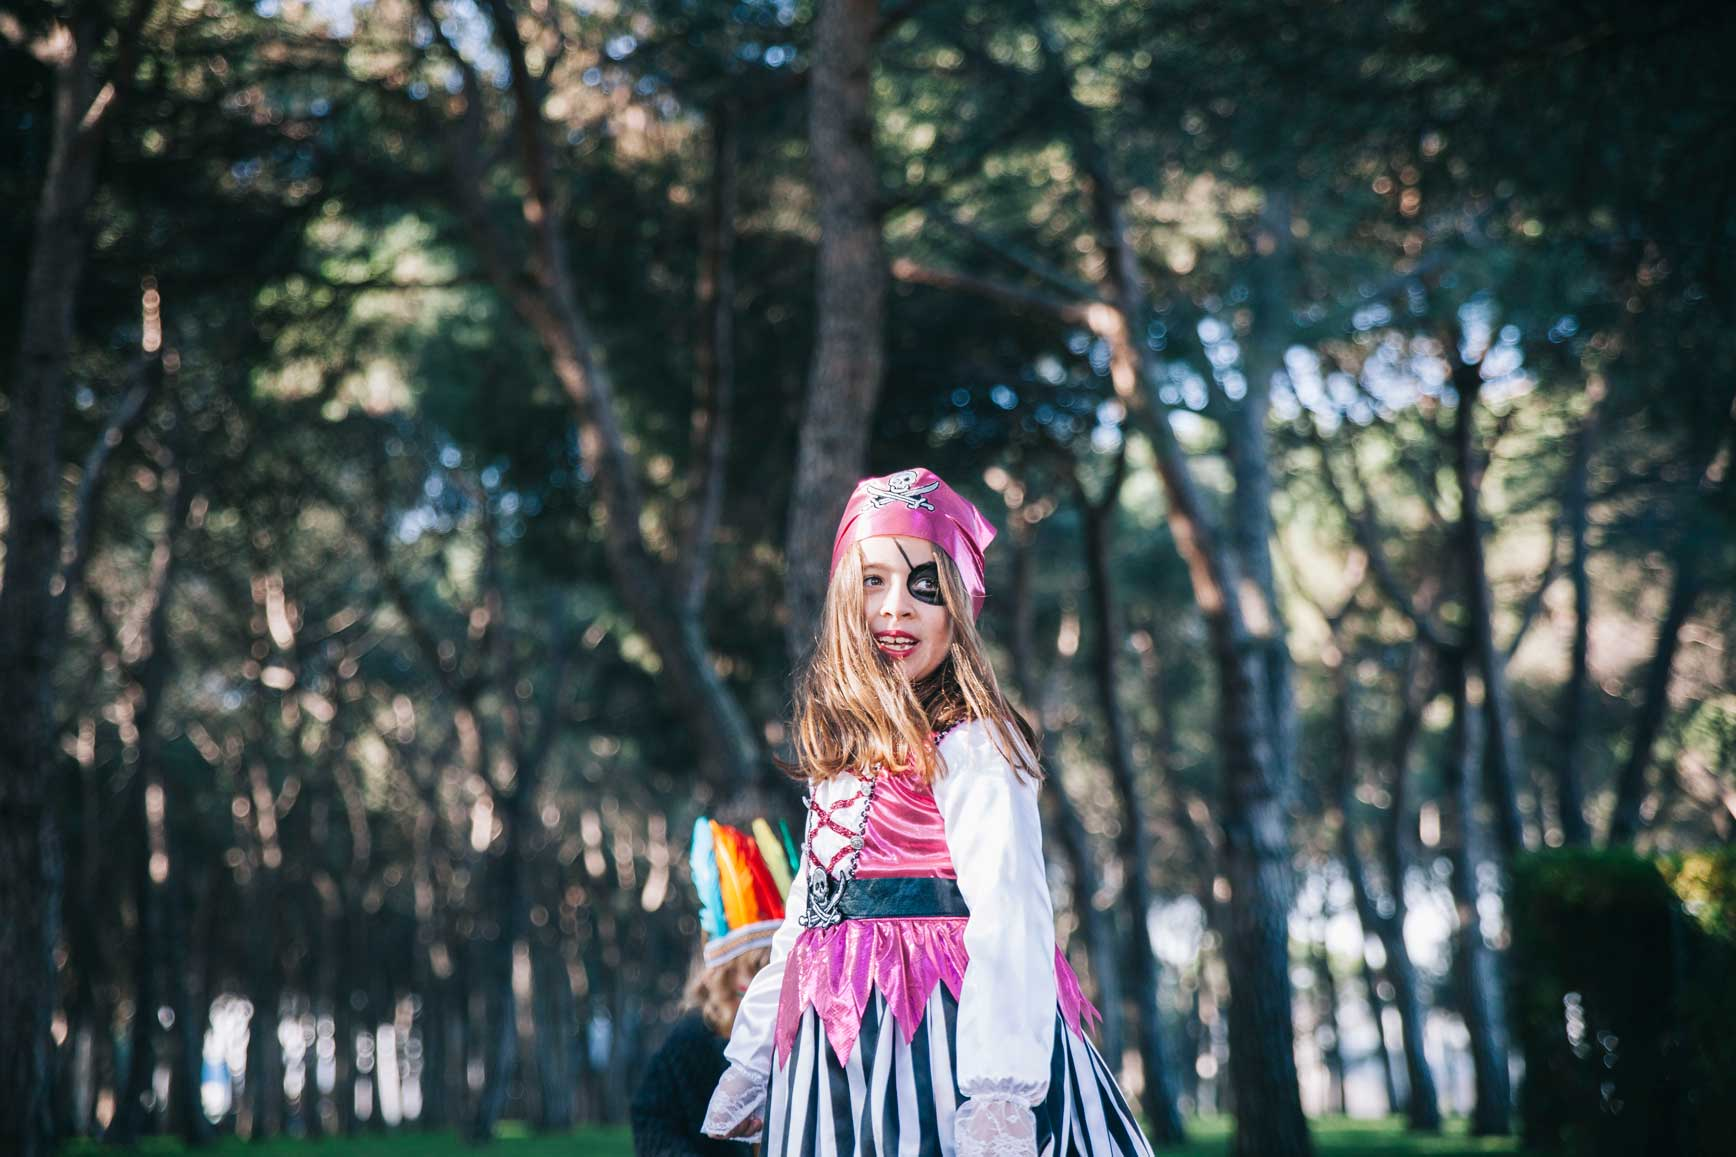 Carnaval-2017-el_corte_ingles-disfraz_Pirata-niña